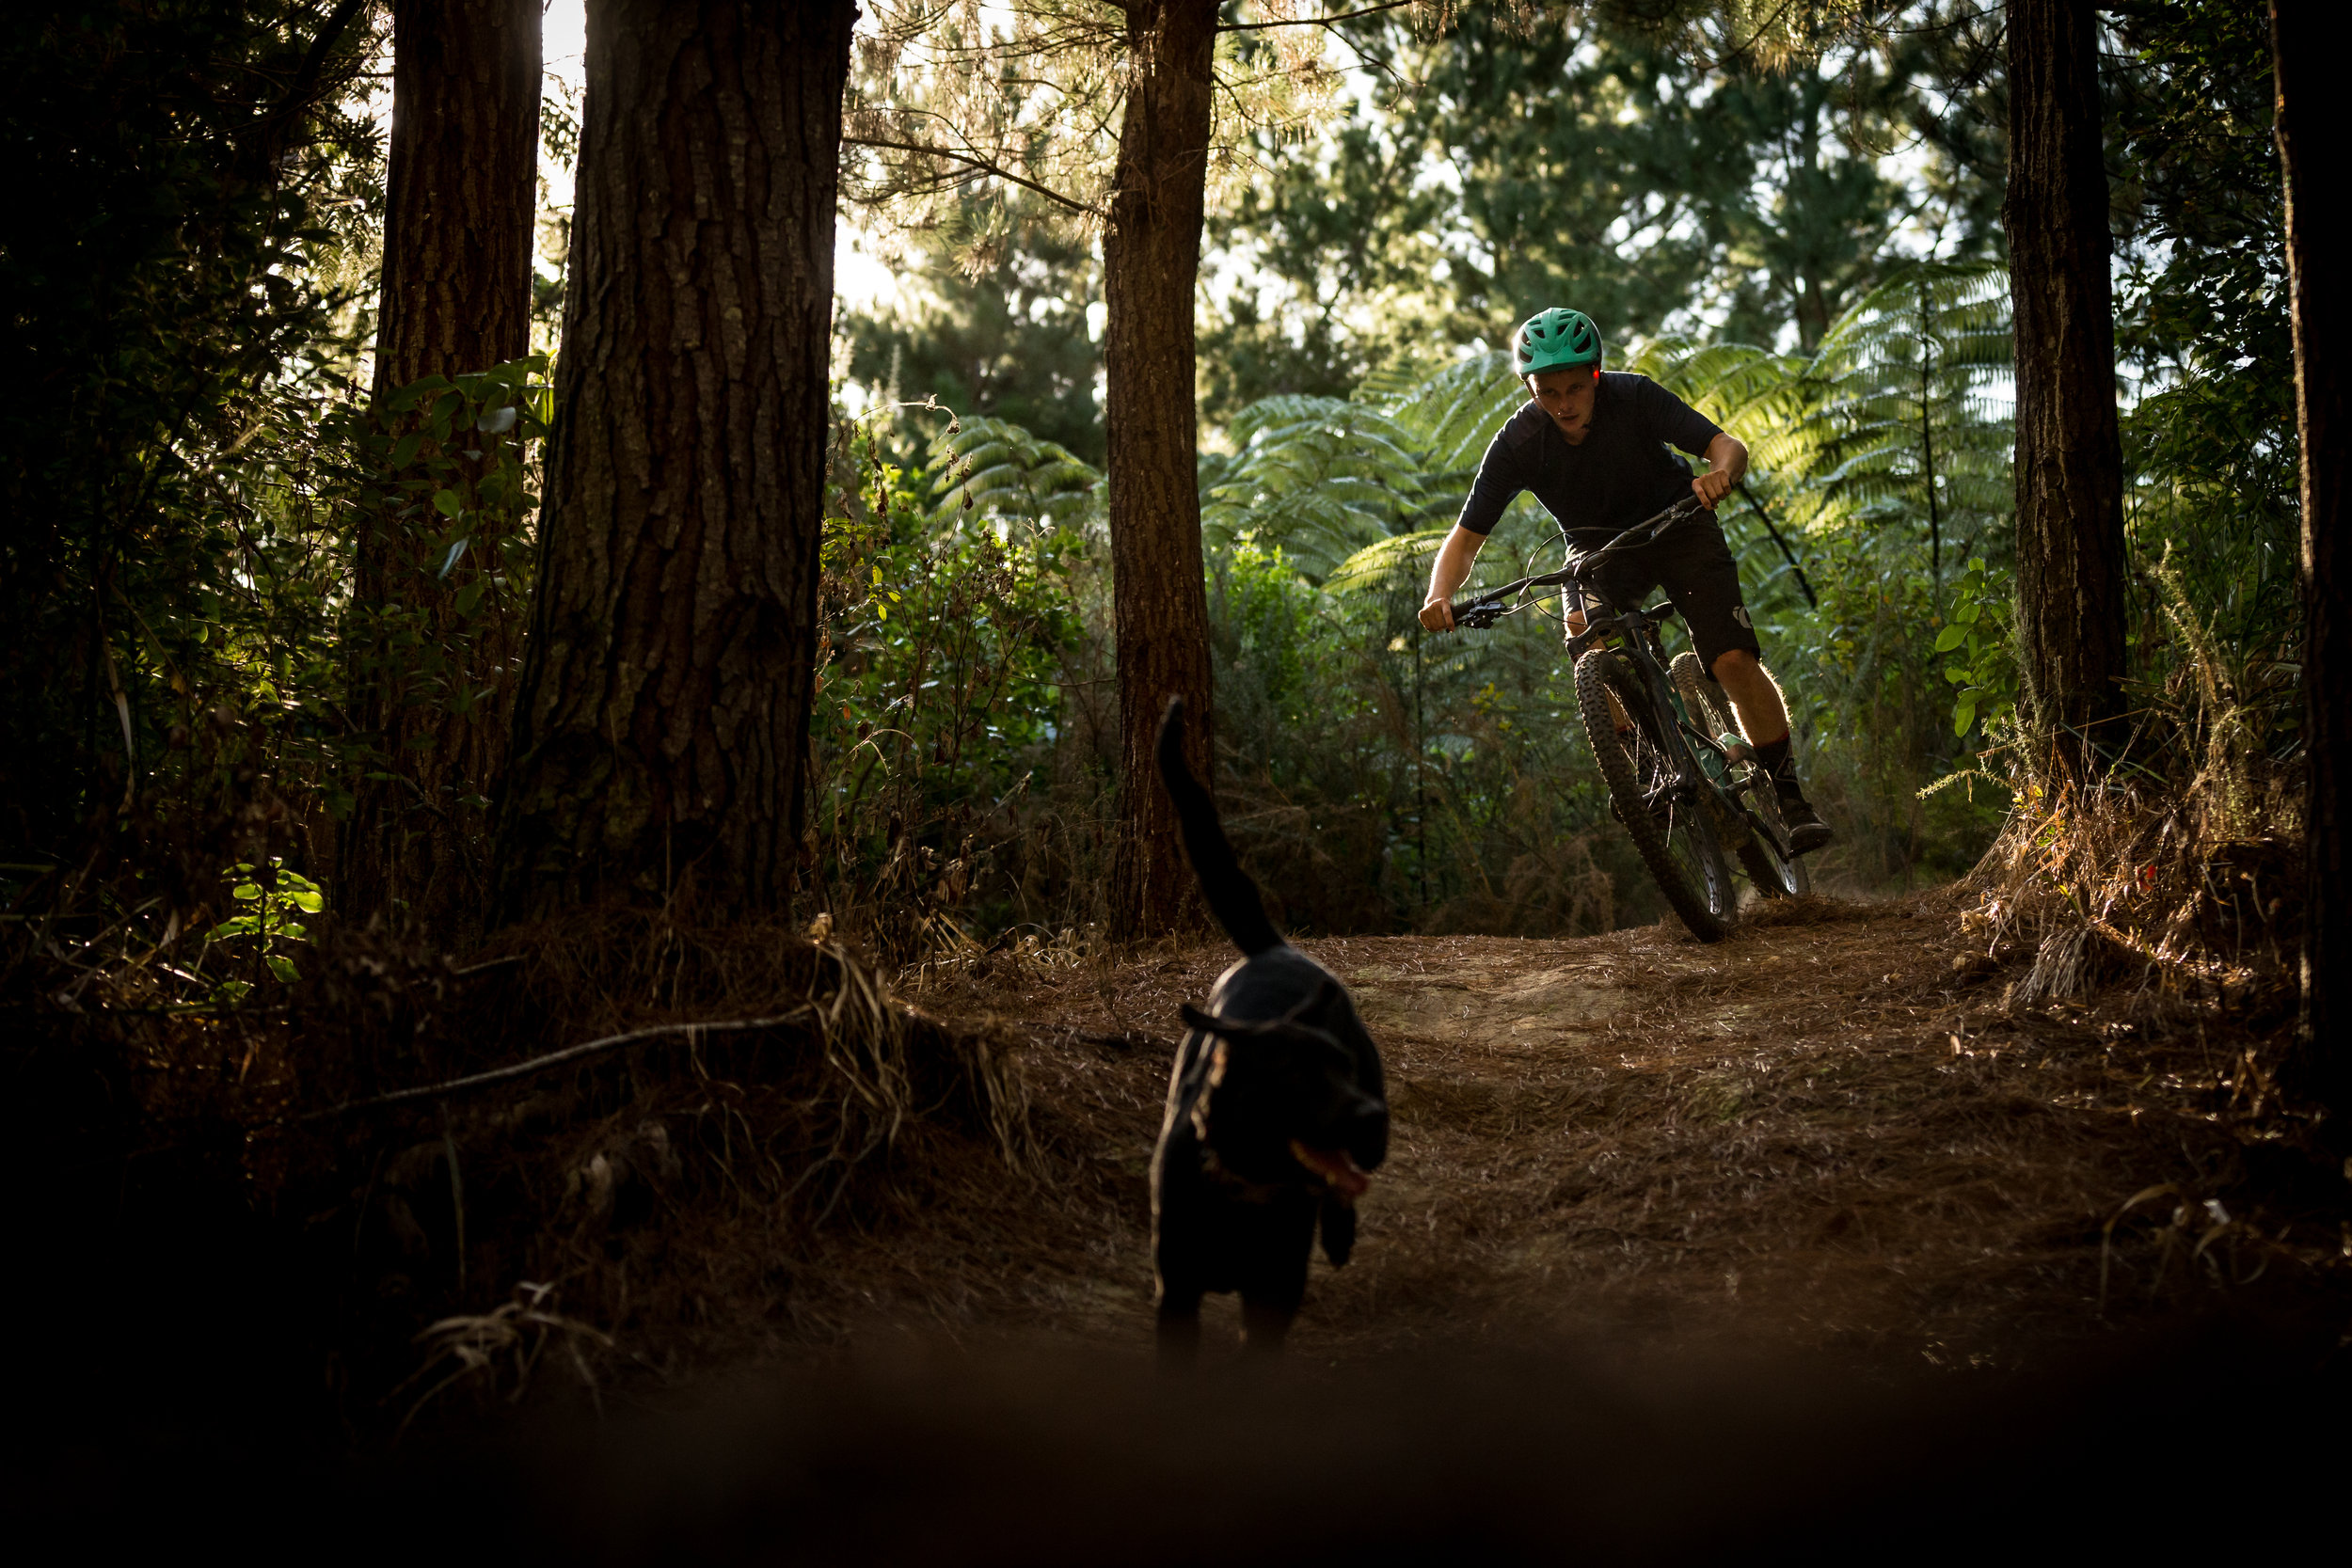 marin_wolfridge9_newzealandmountainbiker3.jpg